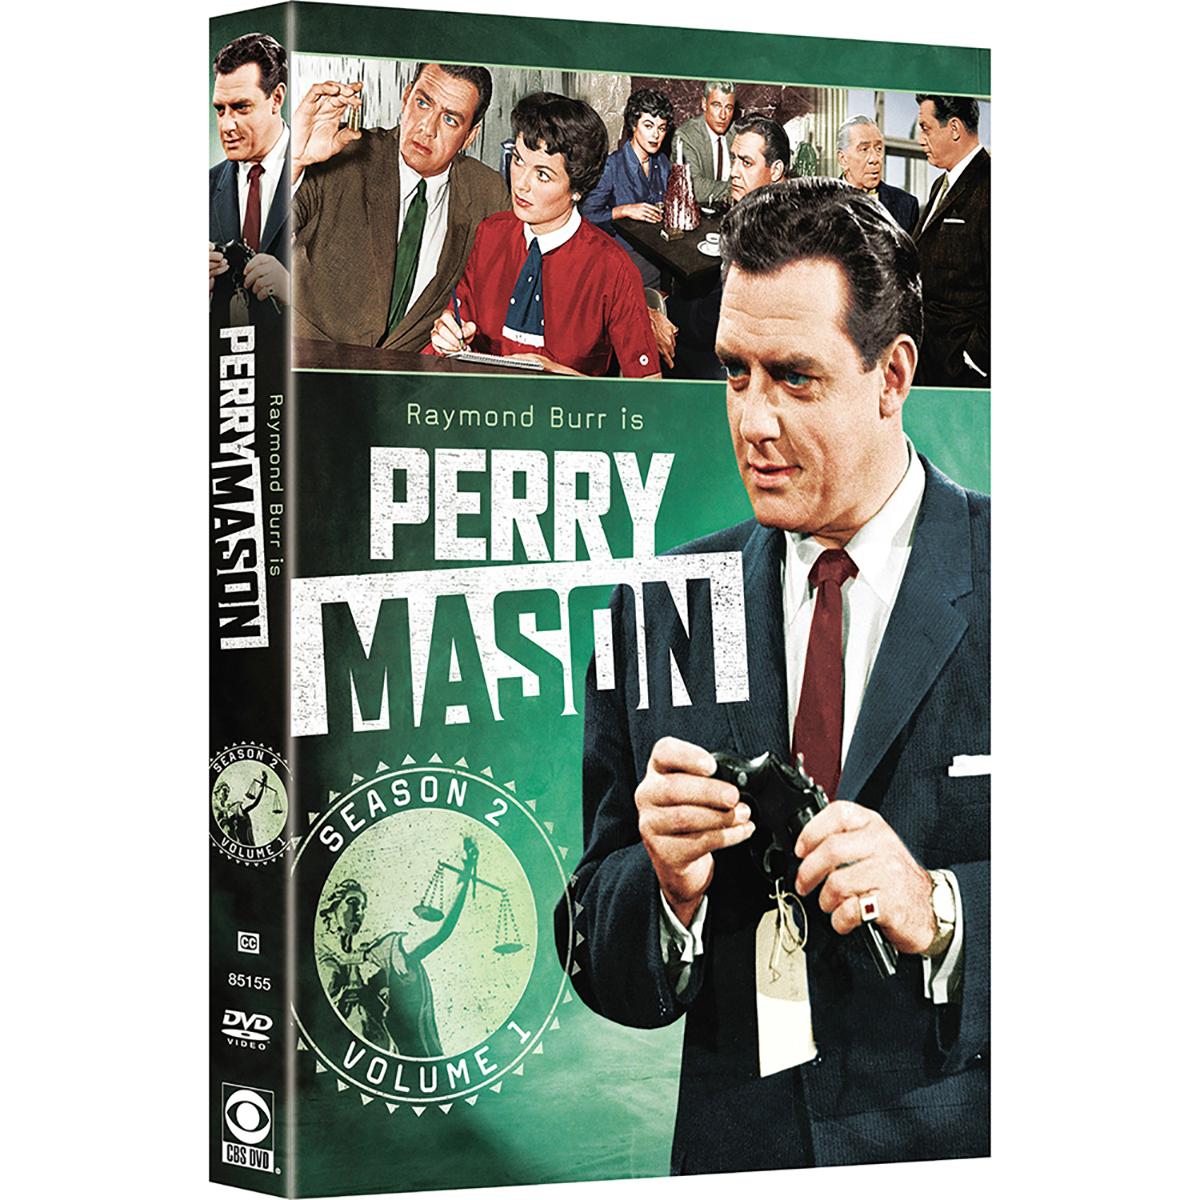 Perry Mason: Season 2 - Volume 1 DVD